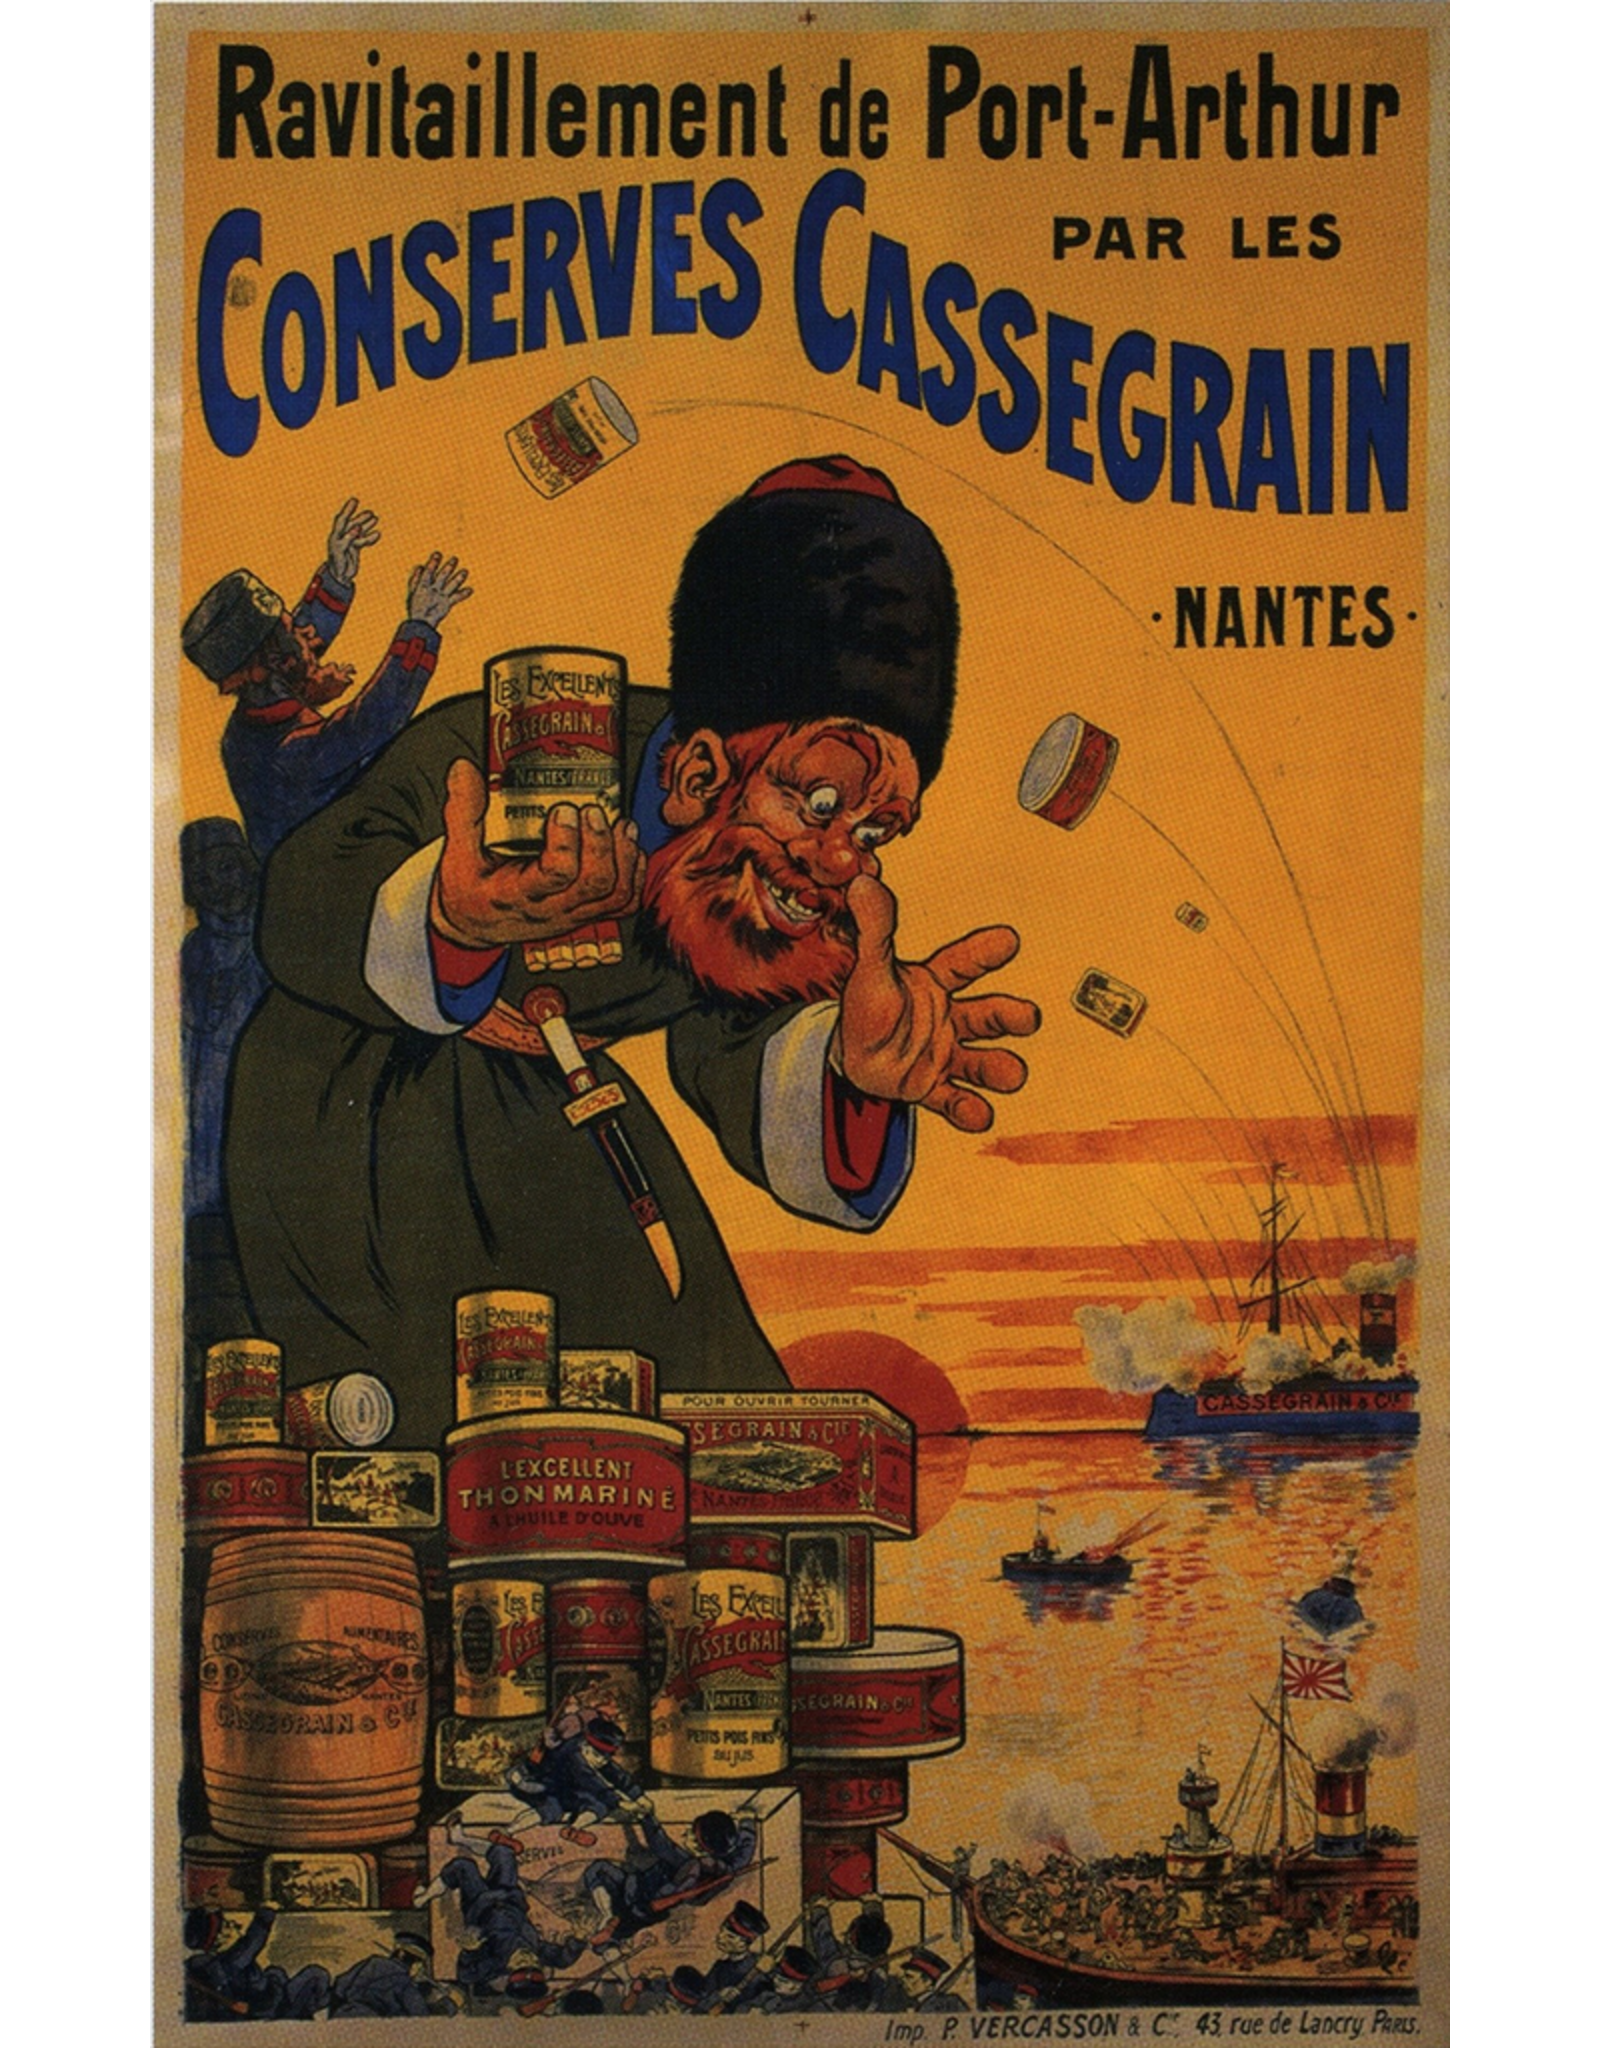 SPV Conserves Cassegrain